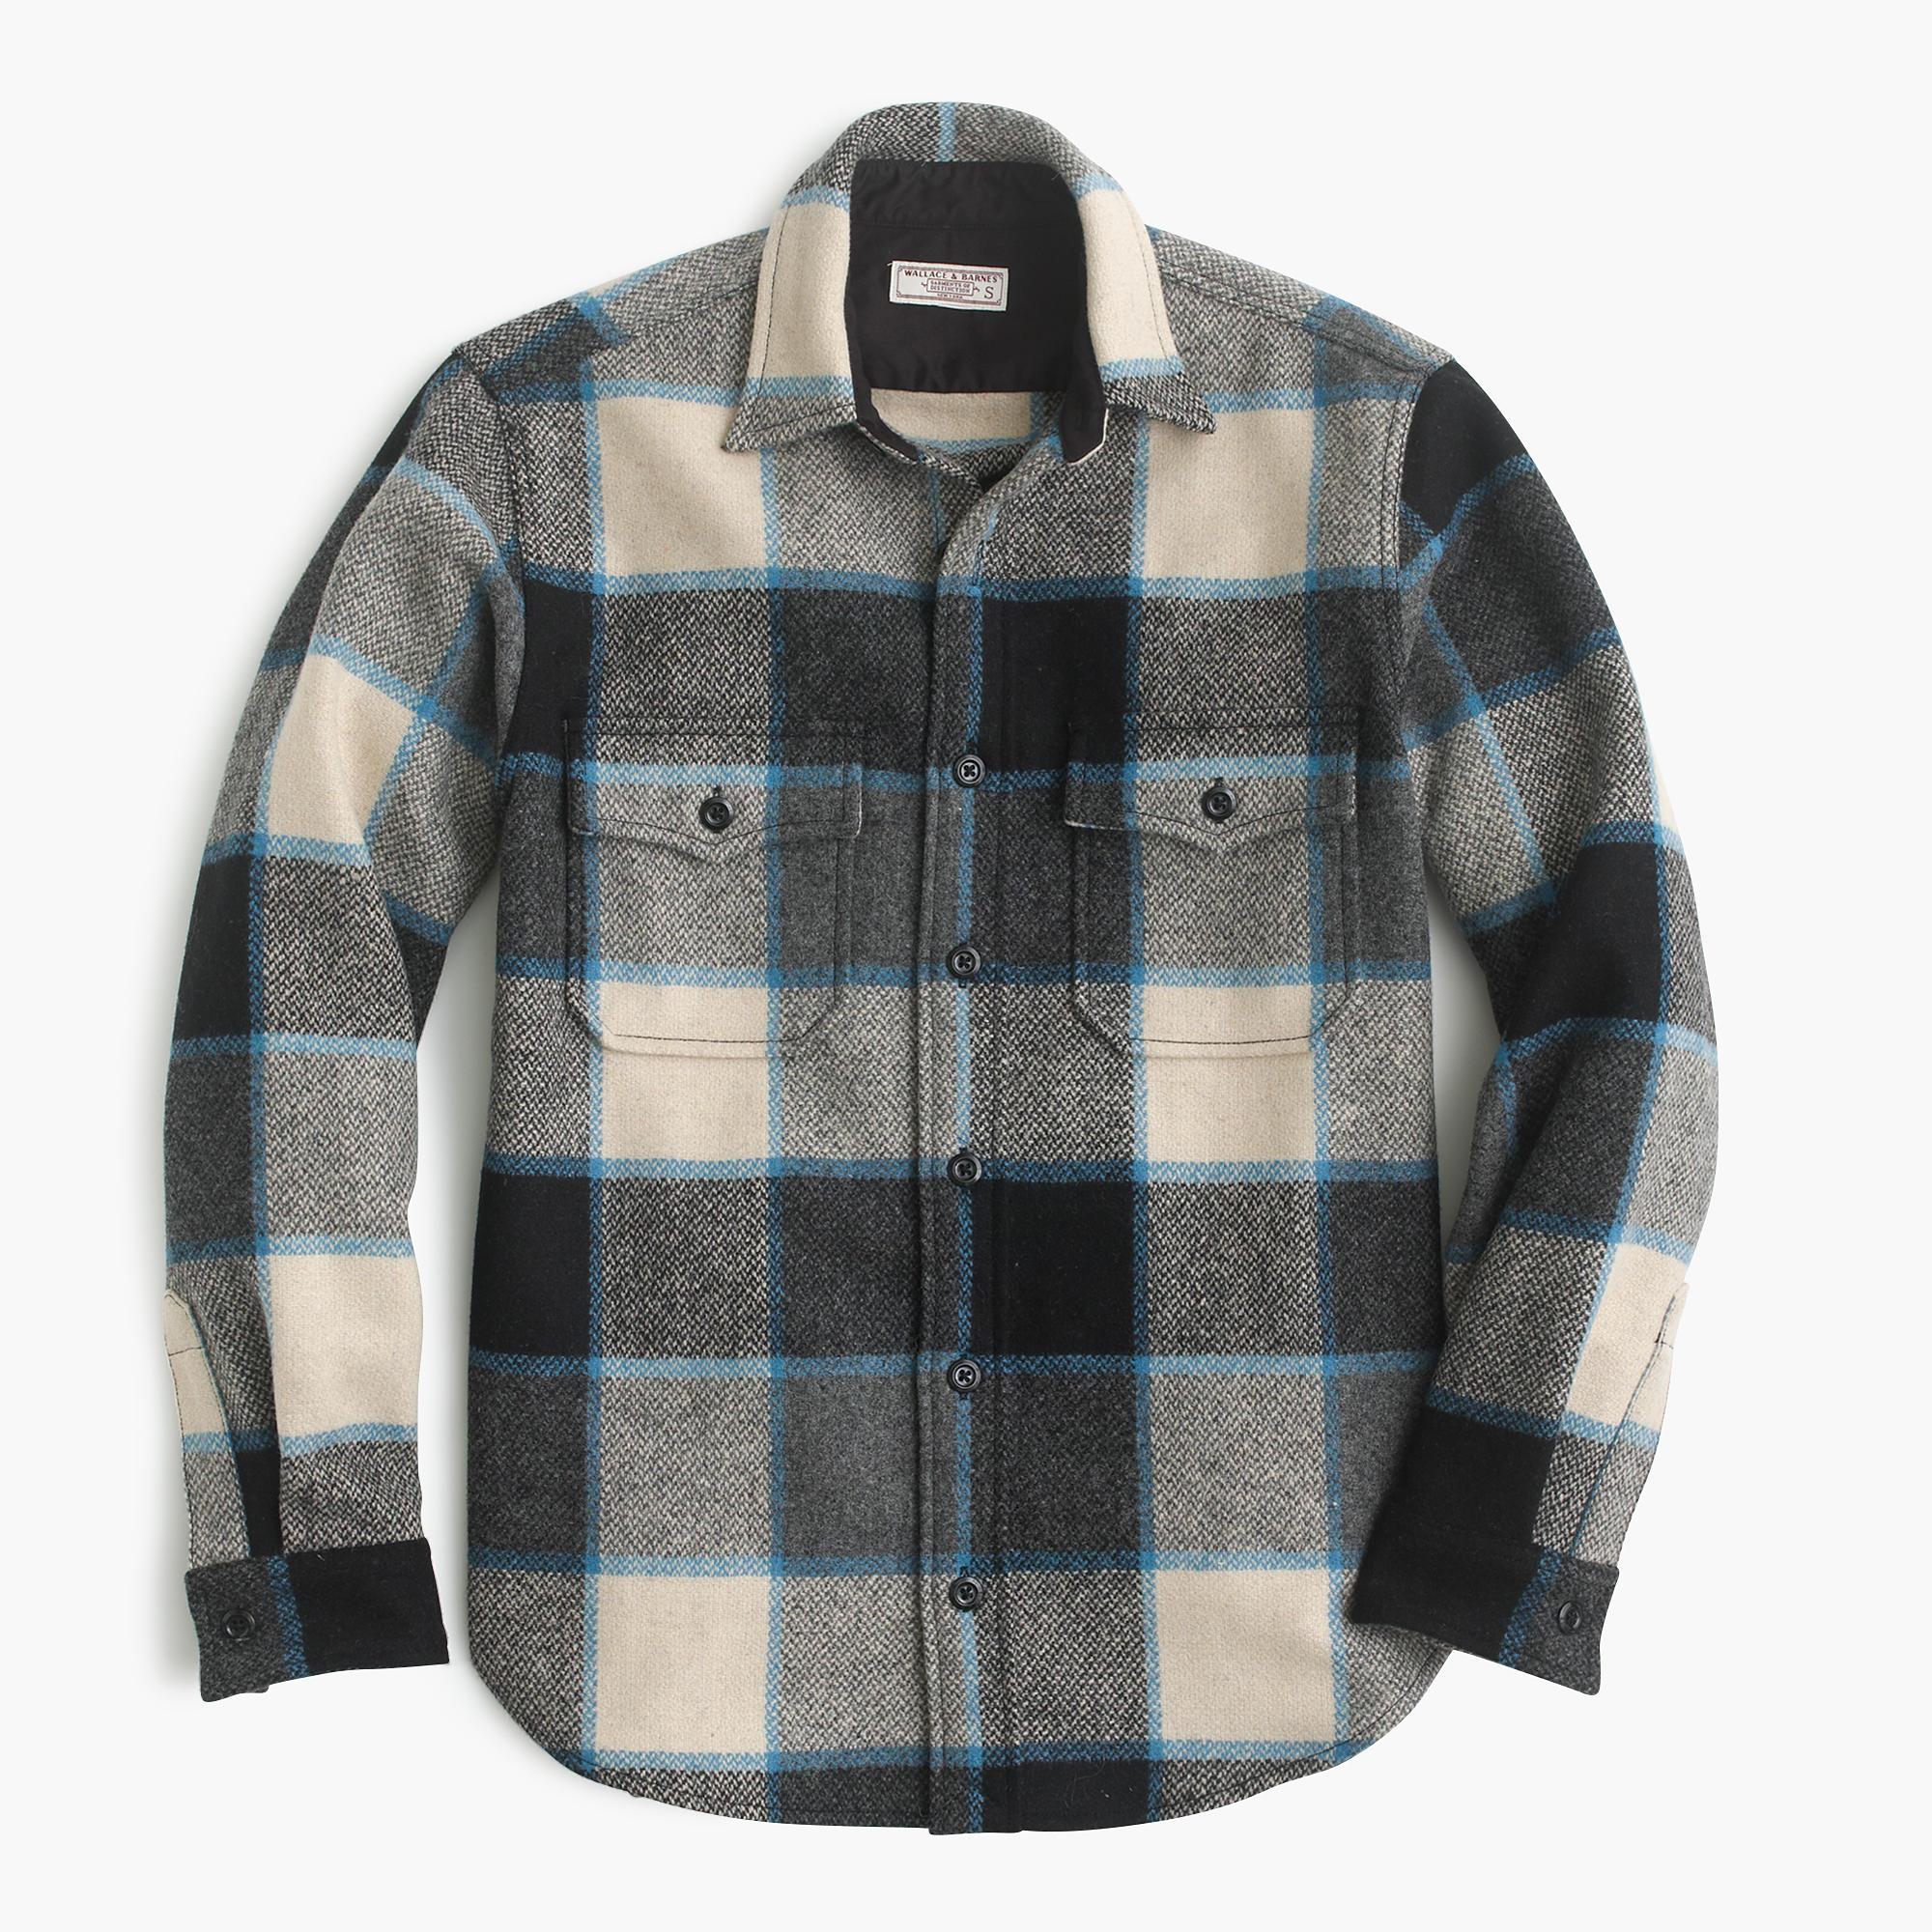 Wallace barnes shirt jacket in wool brookline plaid for Plaid shirt jacket mens